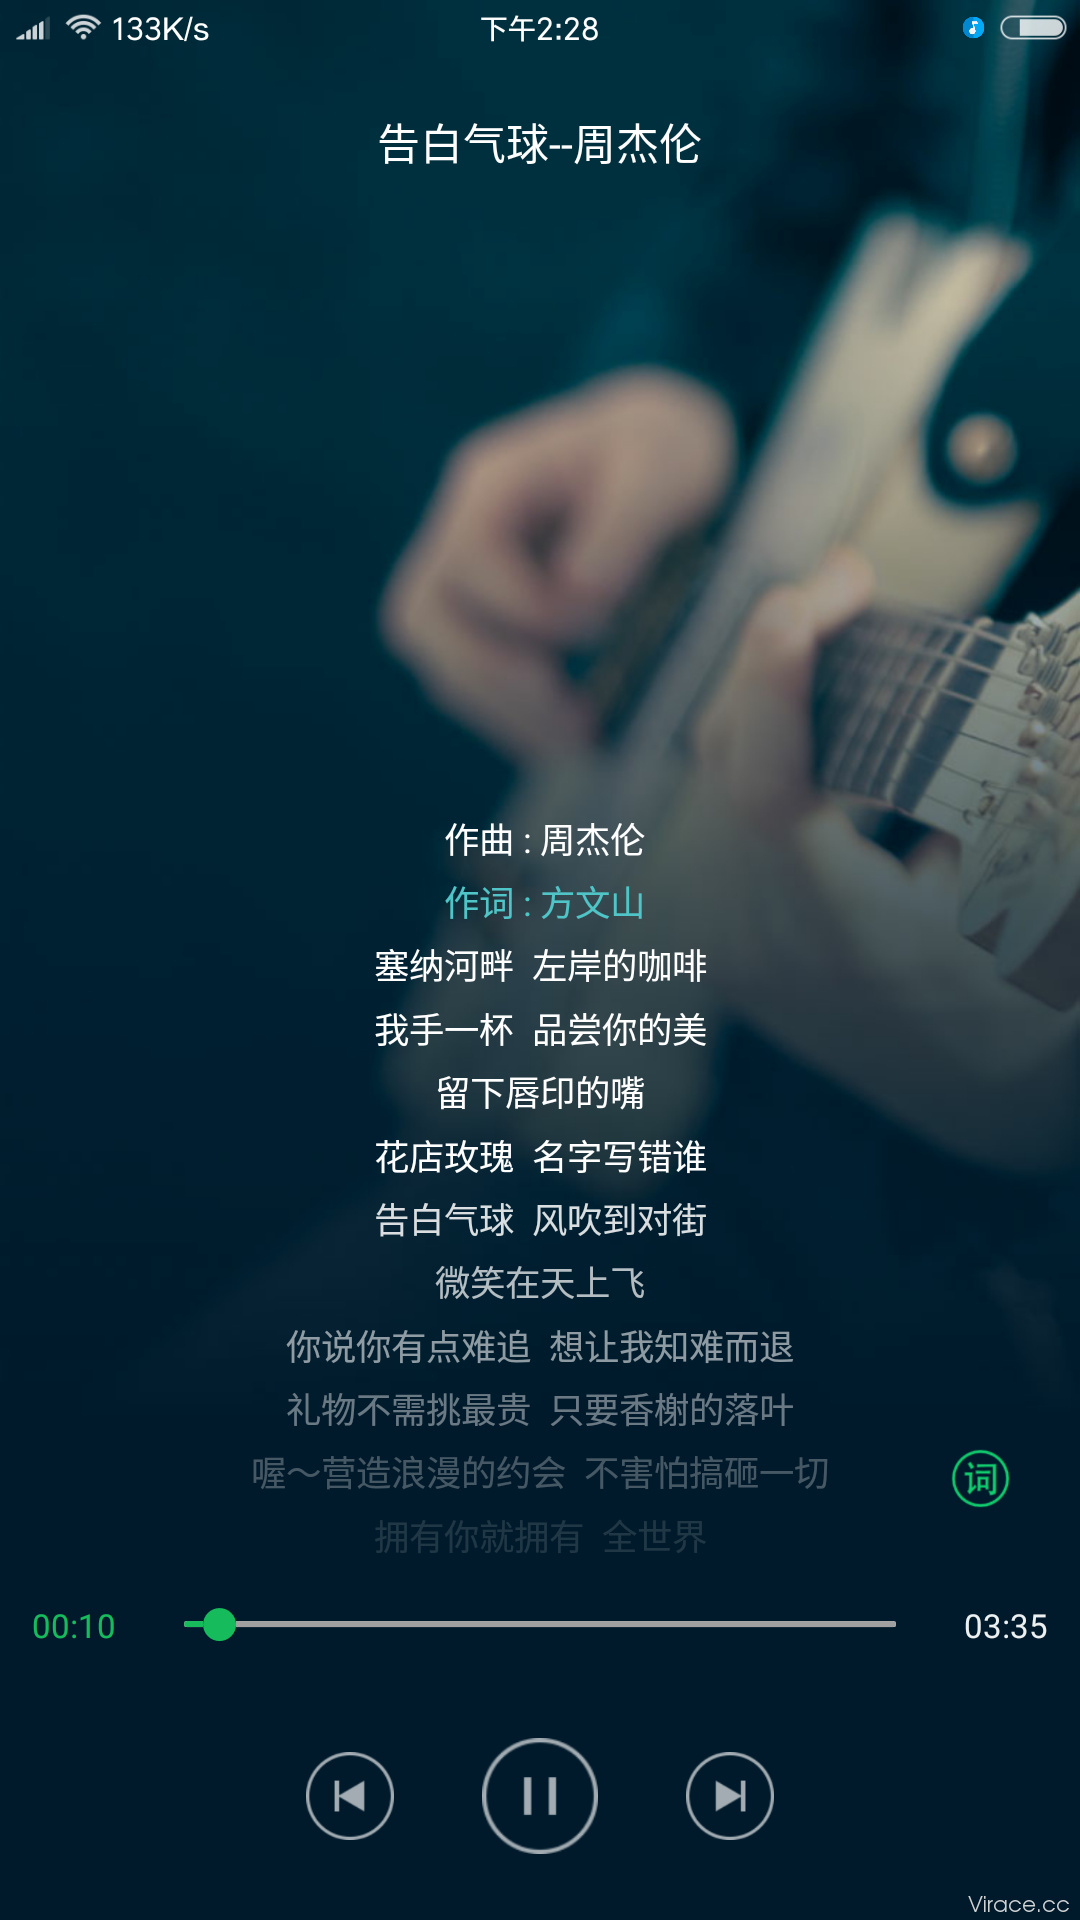 Android 音乐助手 v1.1.6 ,无损音乐/MV免费下载